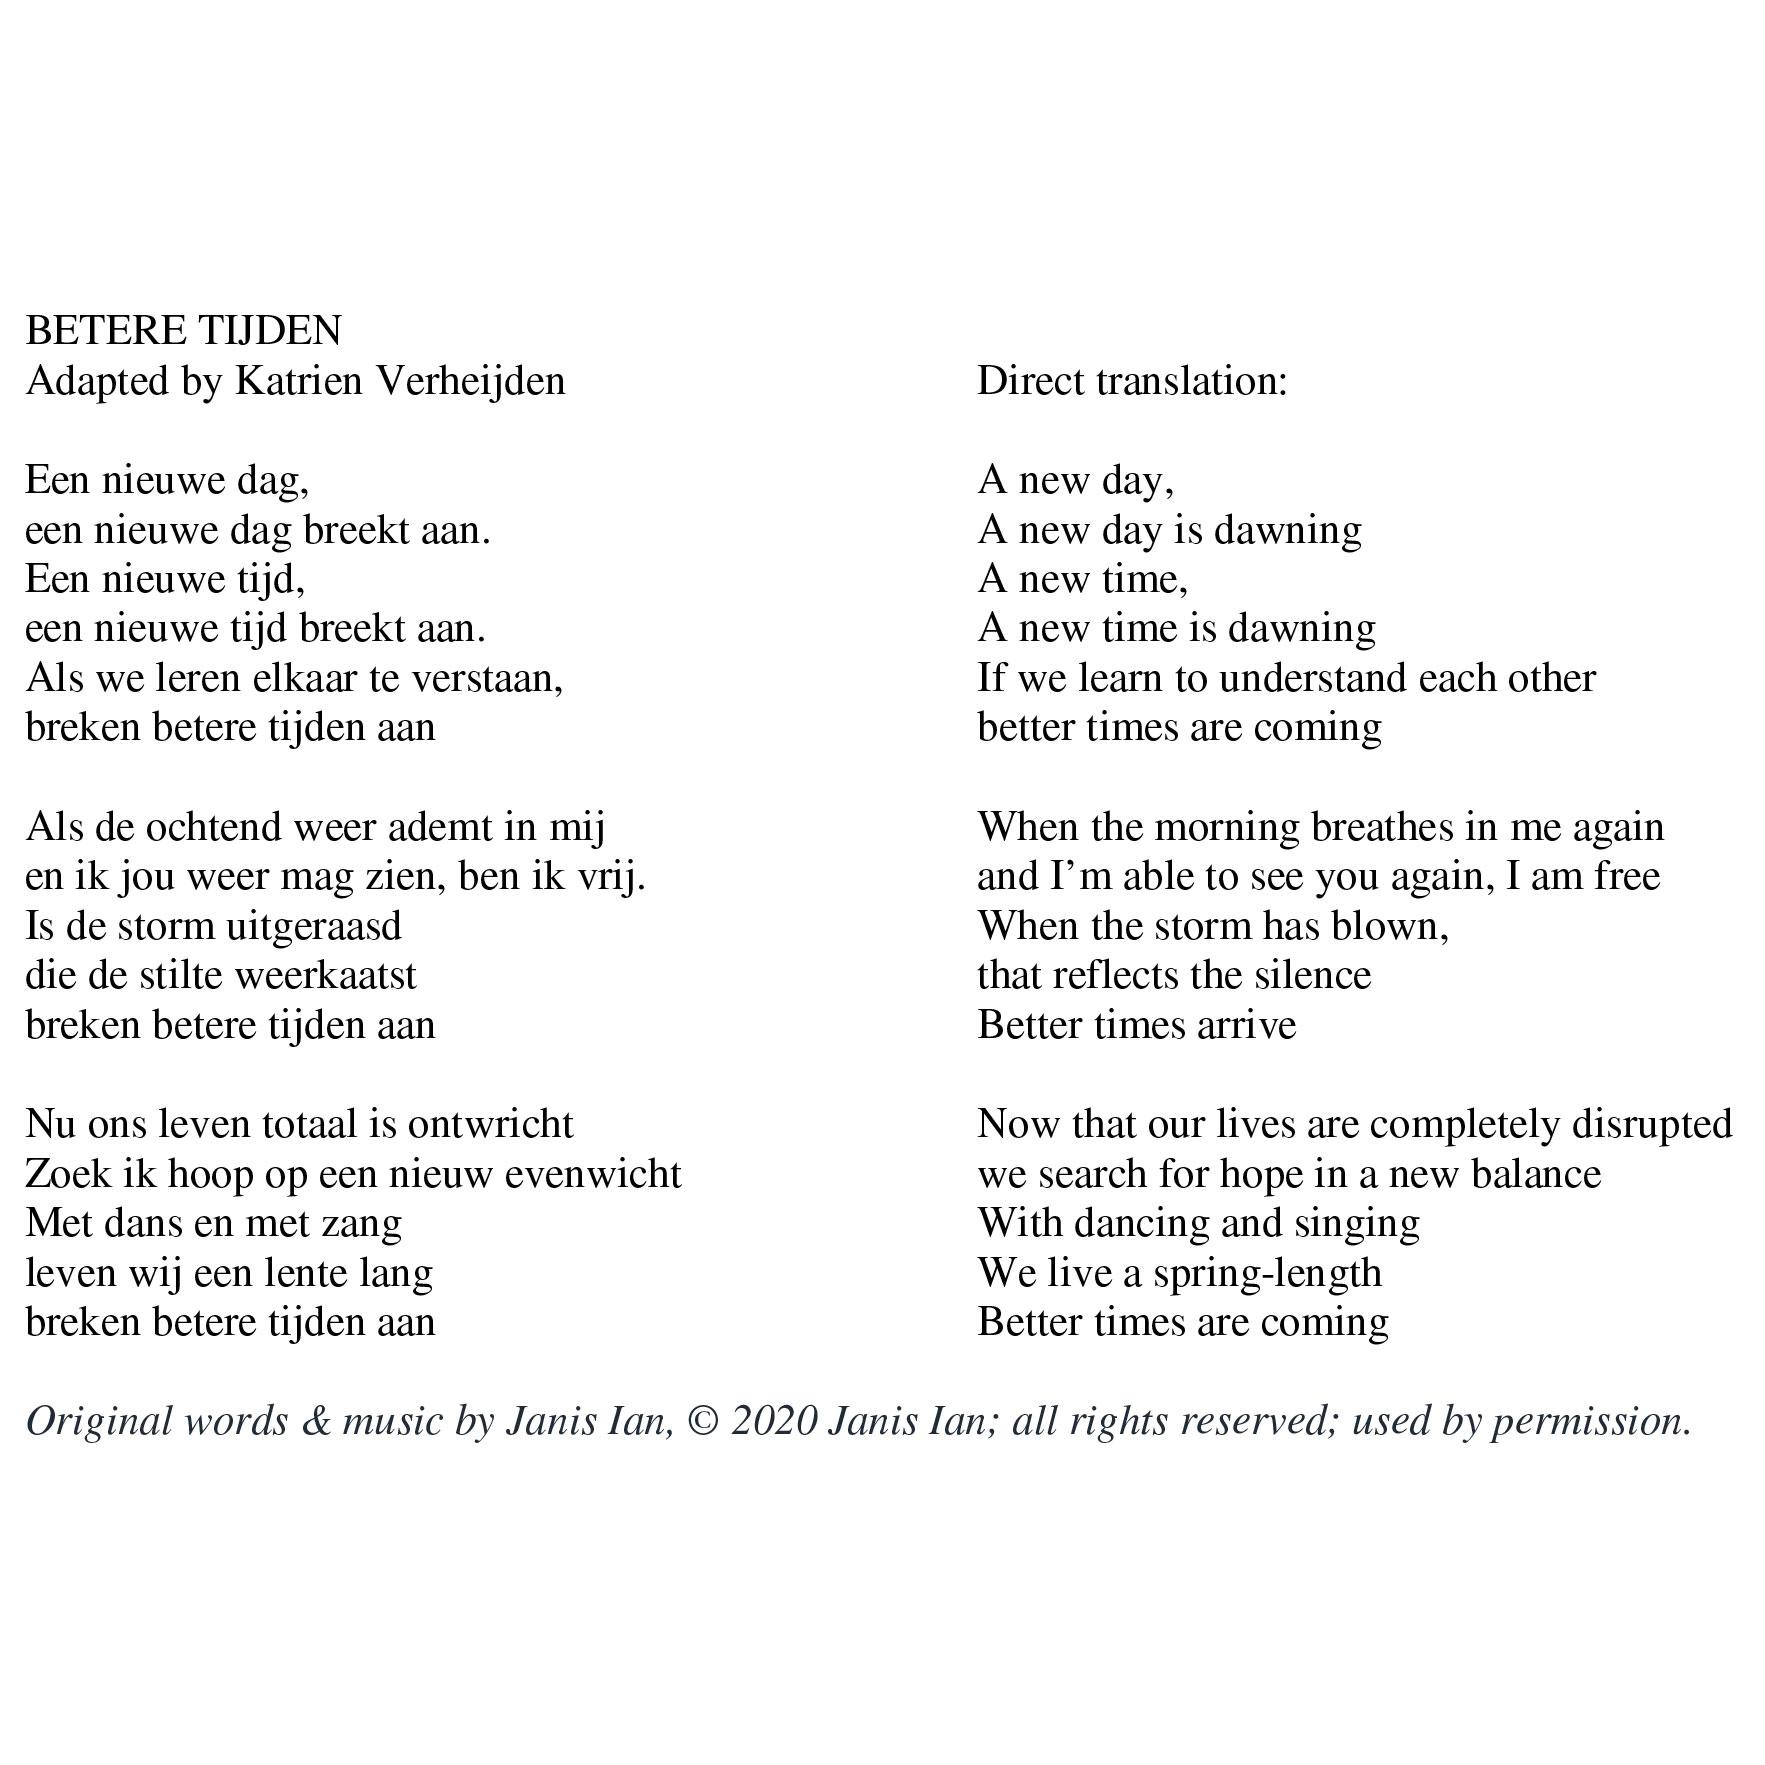 Better Times Will Come by Janis Ian - Dutch lyrics by Katrien Verheijden